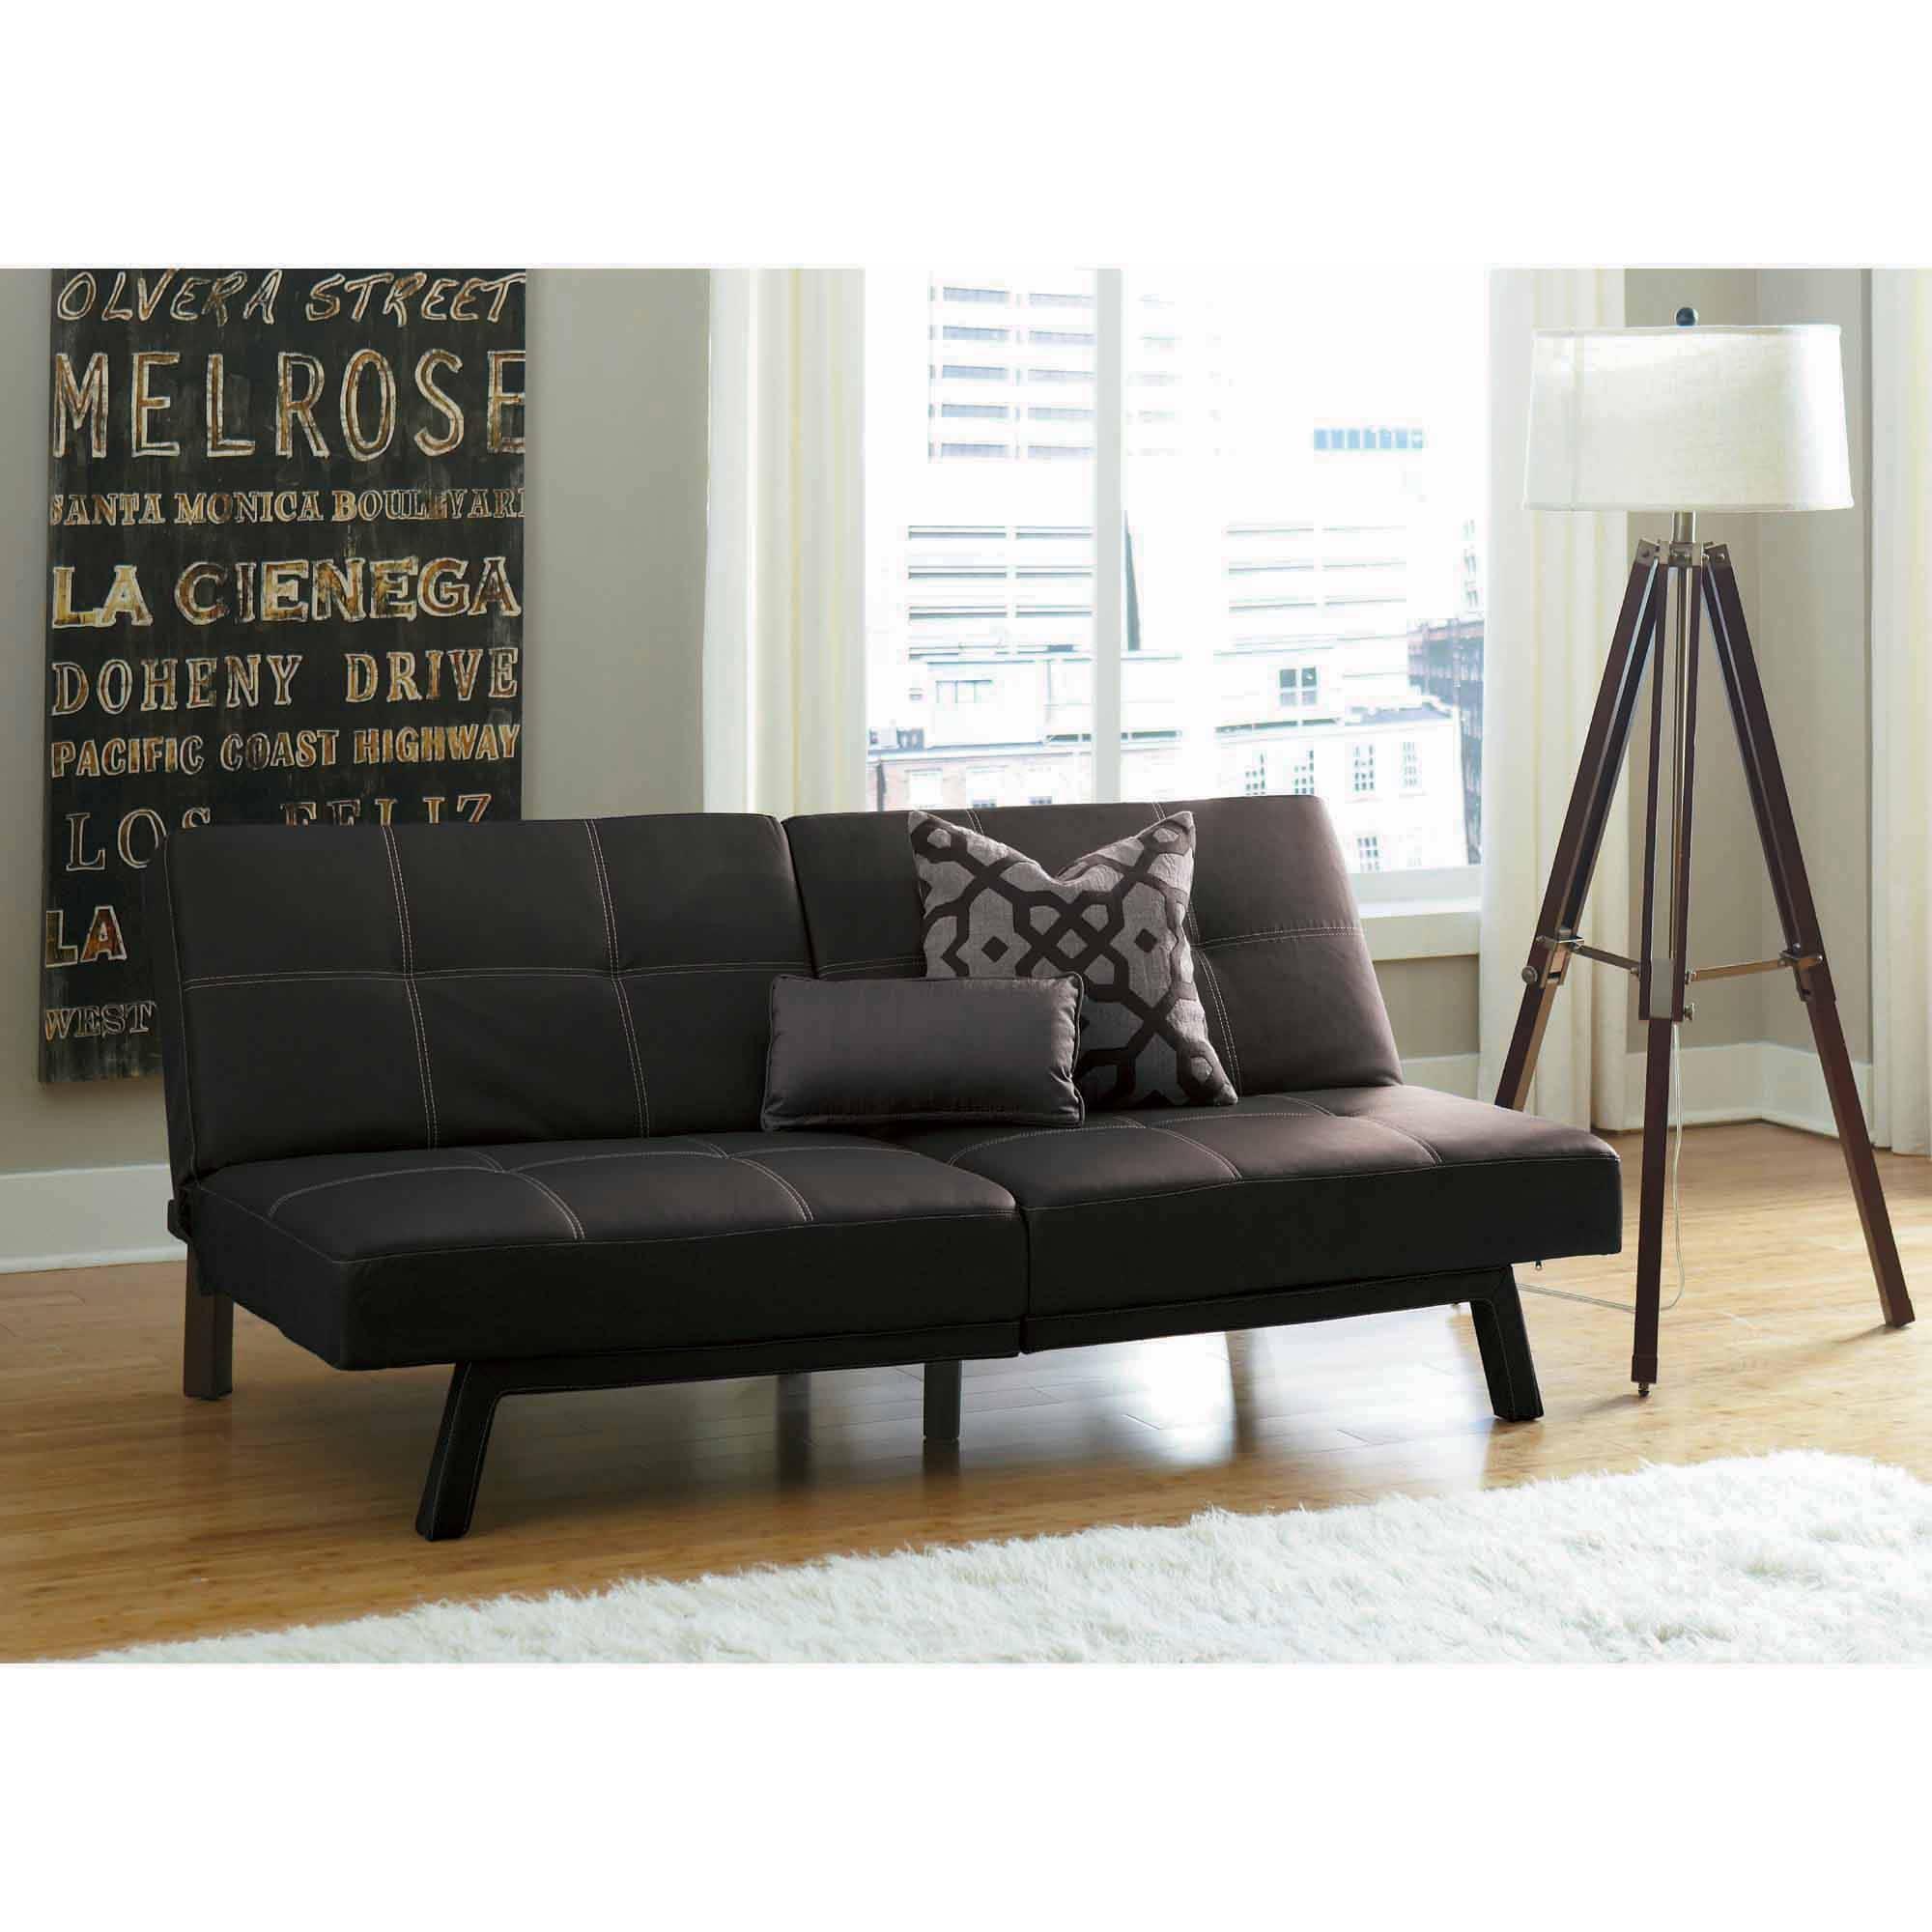 Delaney Split Back Futon Sofa Bed, Multiple Colors – Walmart Throughout Faux Leather Futon Sofas (Image 2 of 20)